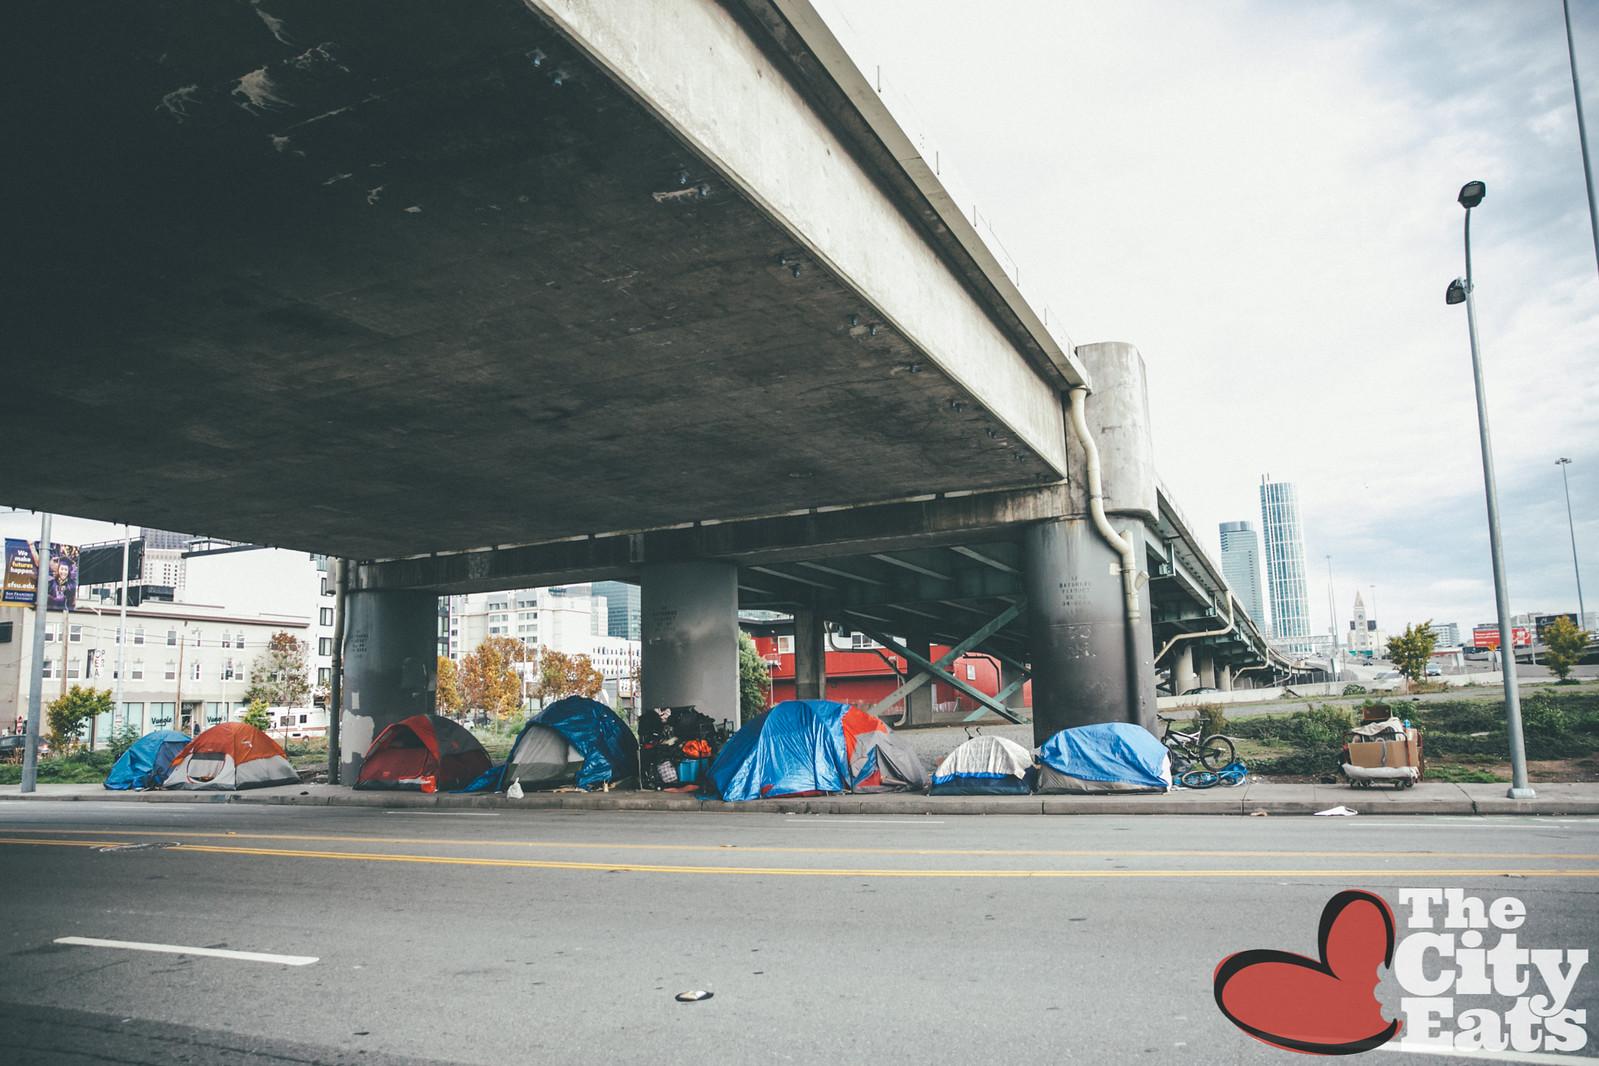 CityEatsThanksgiving0110-X3.jpg